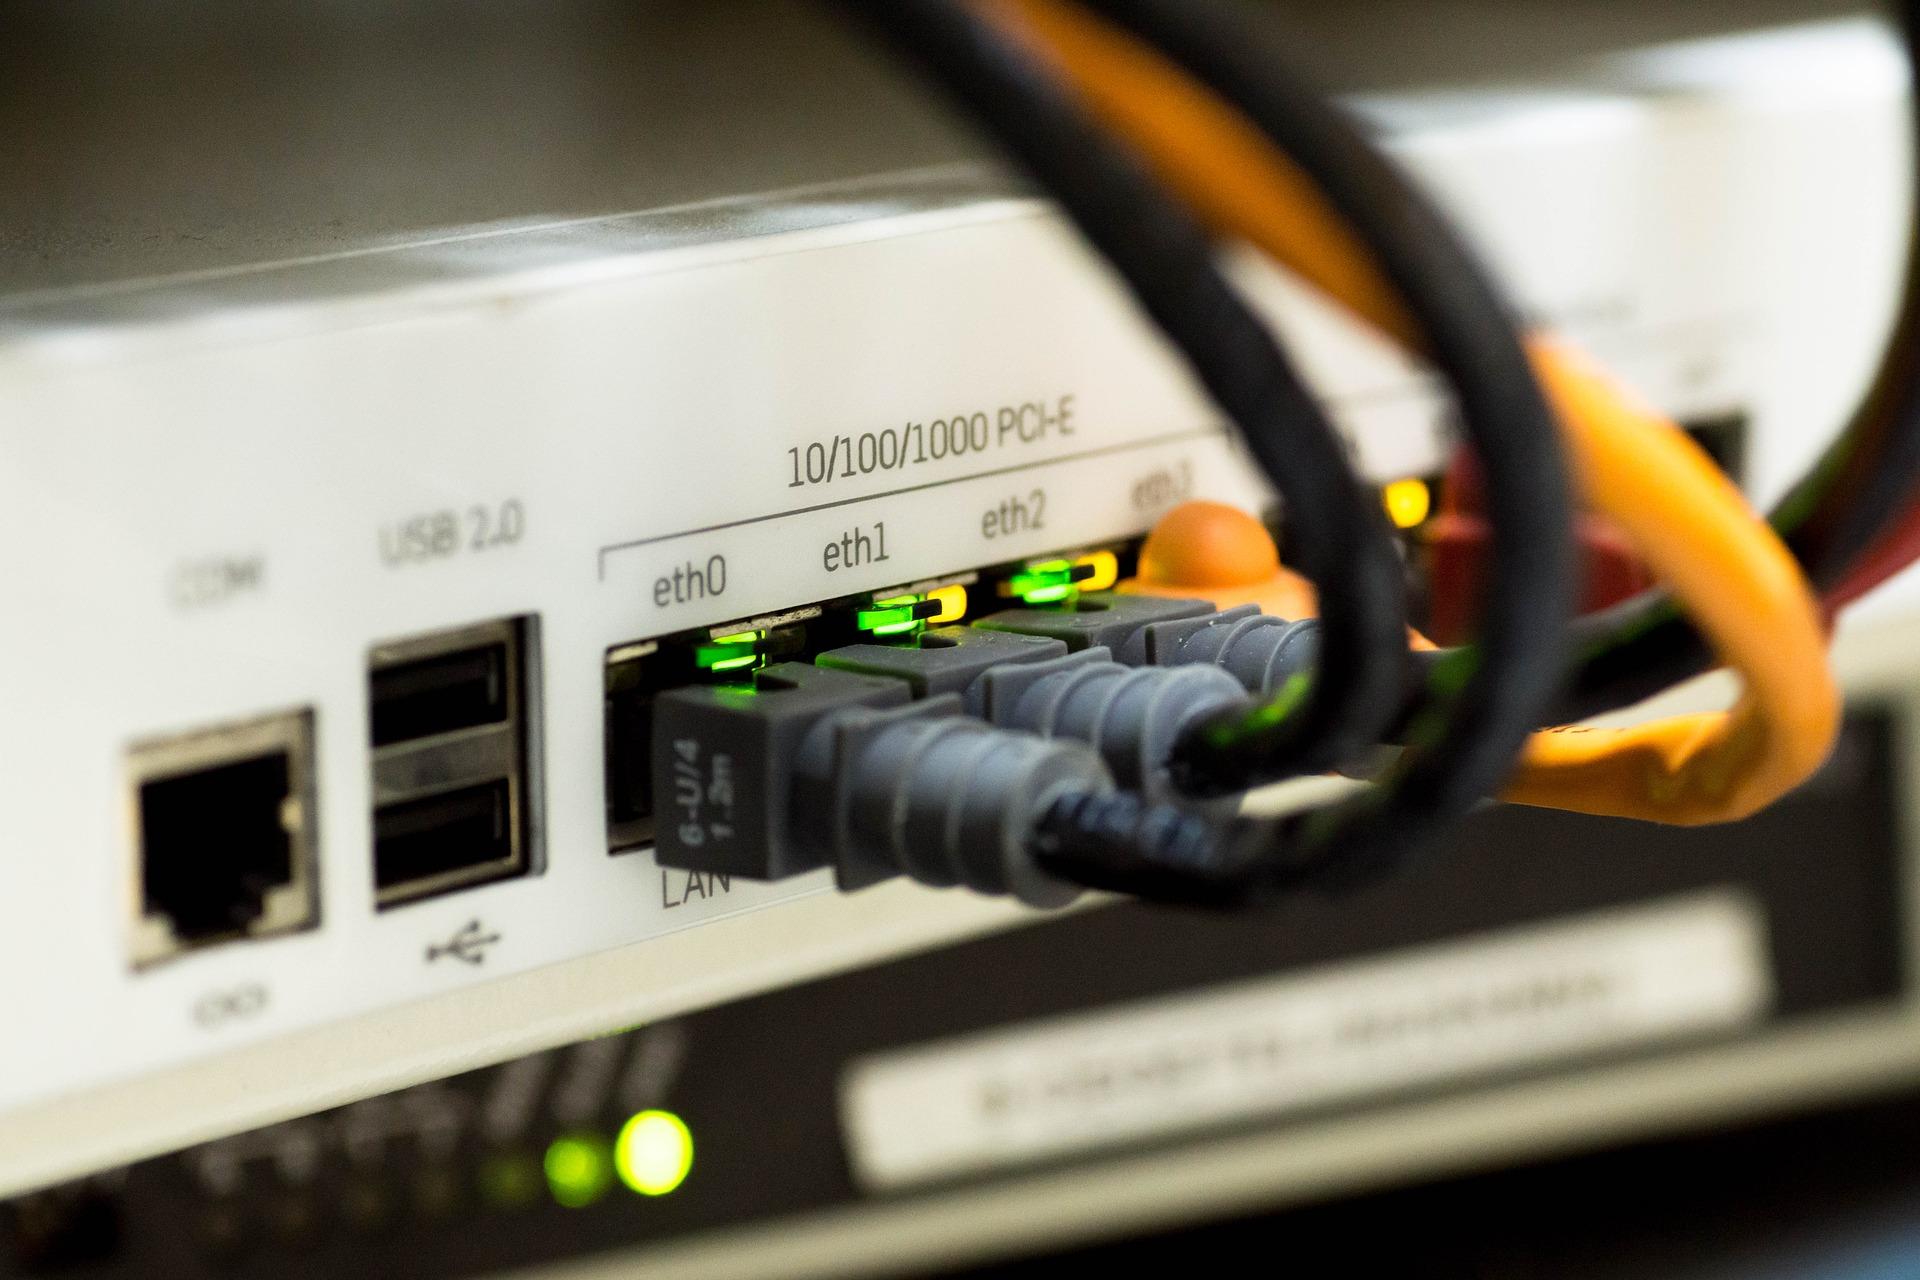 wifi ou ethernet connexion internet